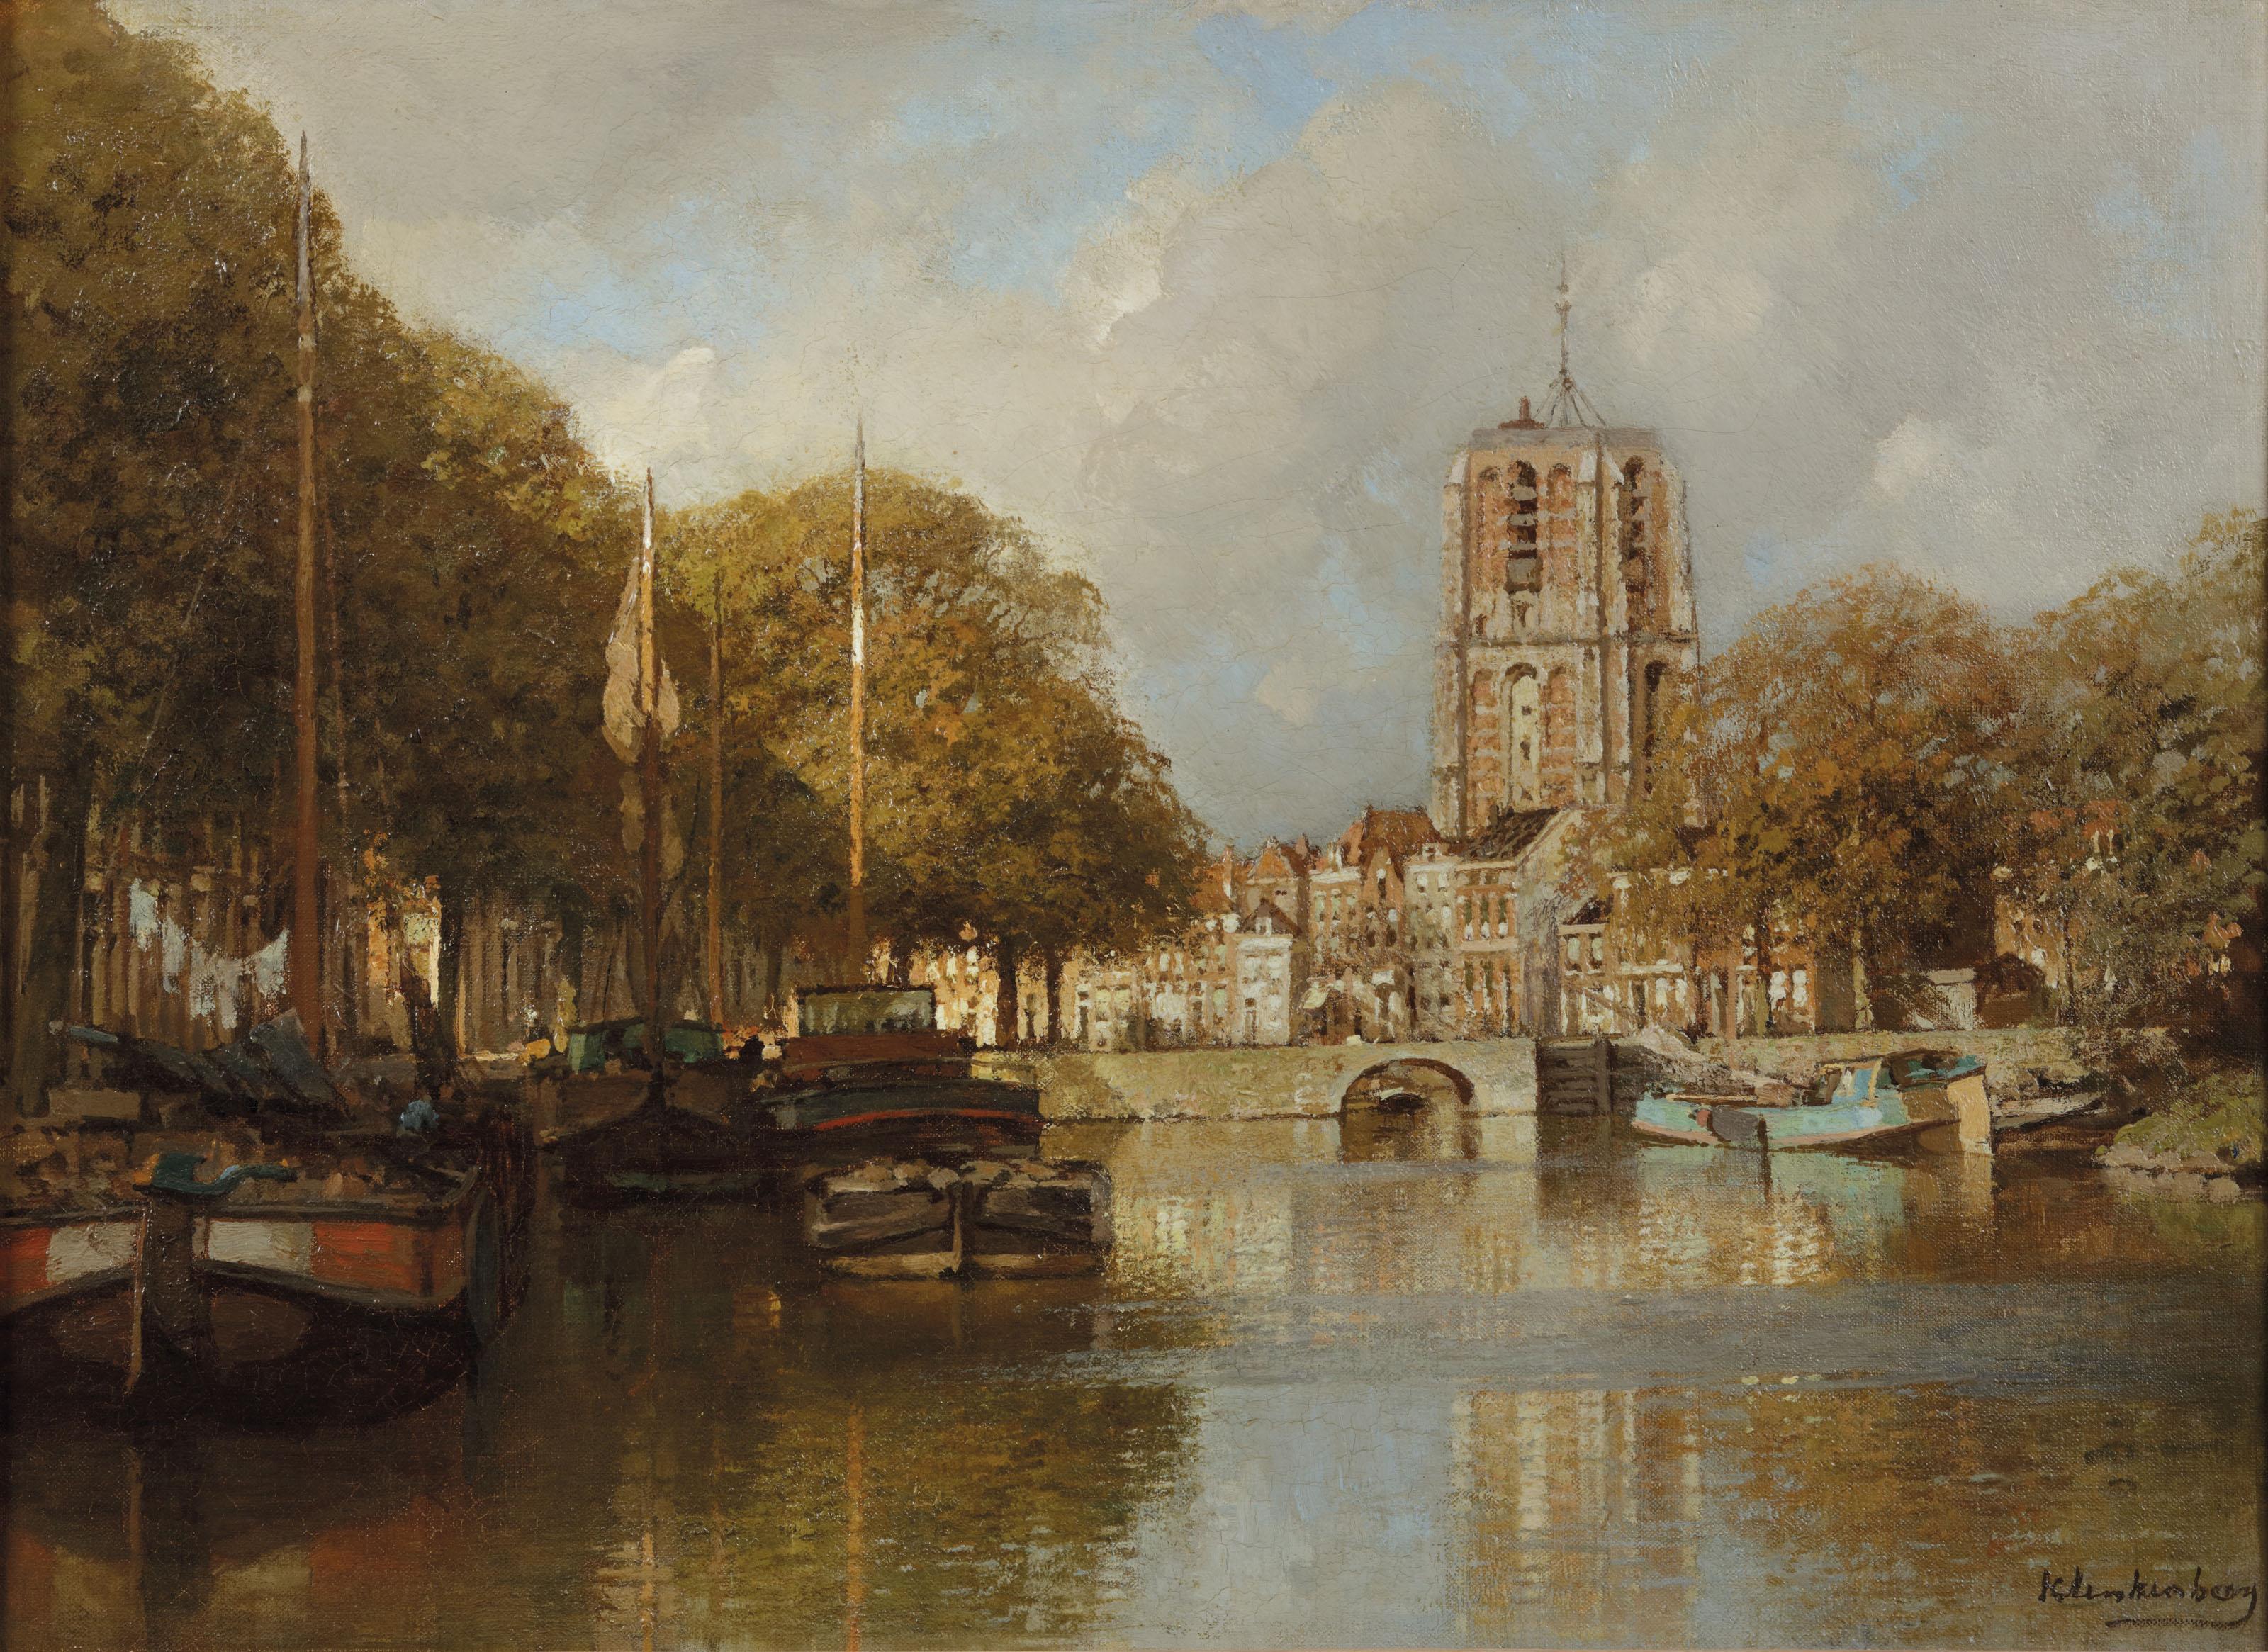 Johannes Christiaan Karel Klinkenberg (Dutch, 1852-1924)